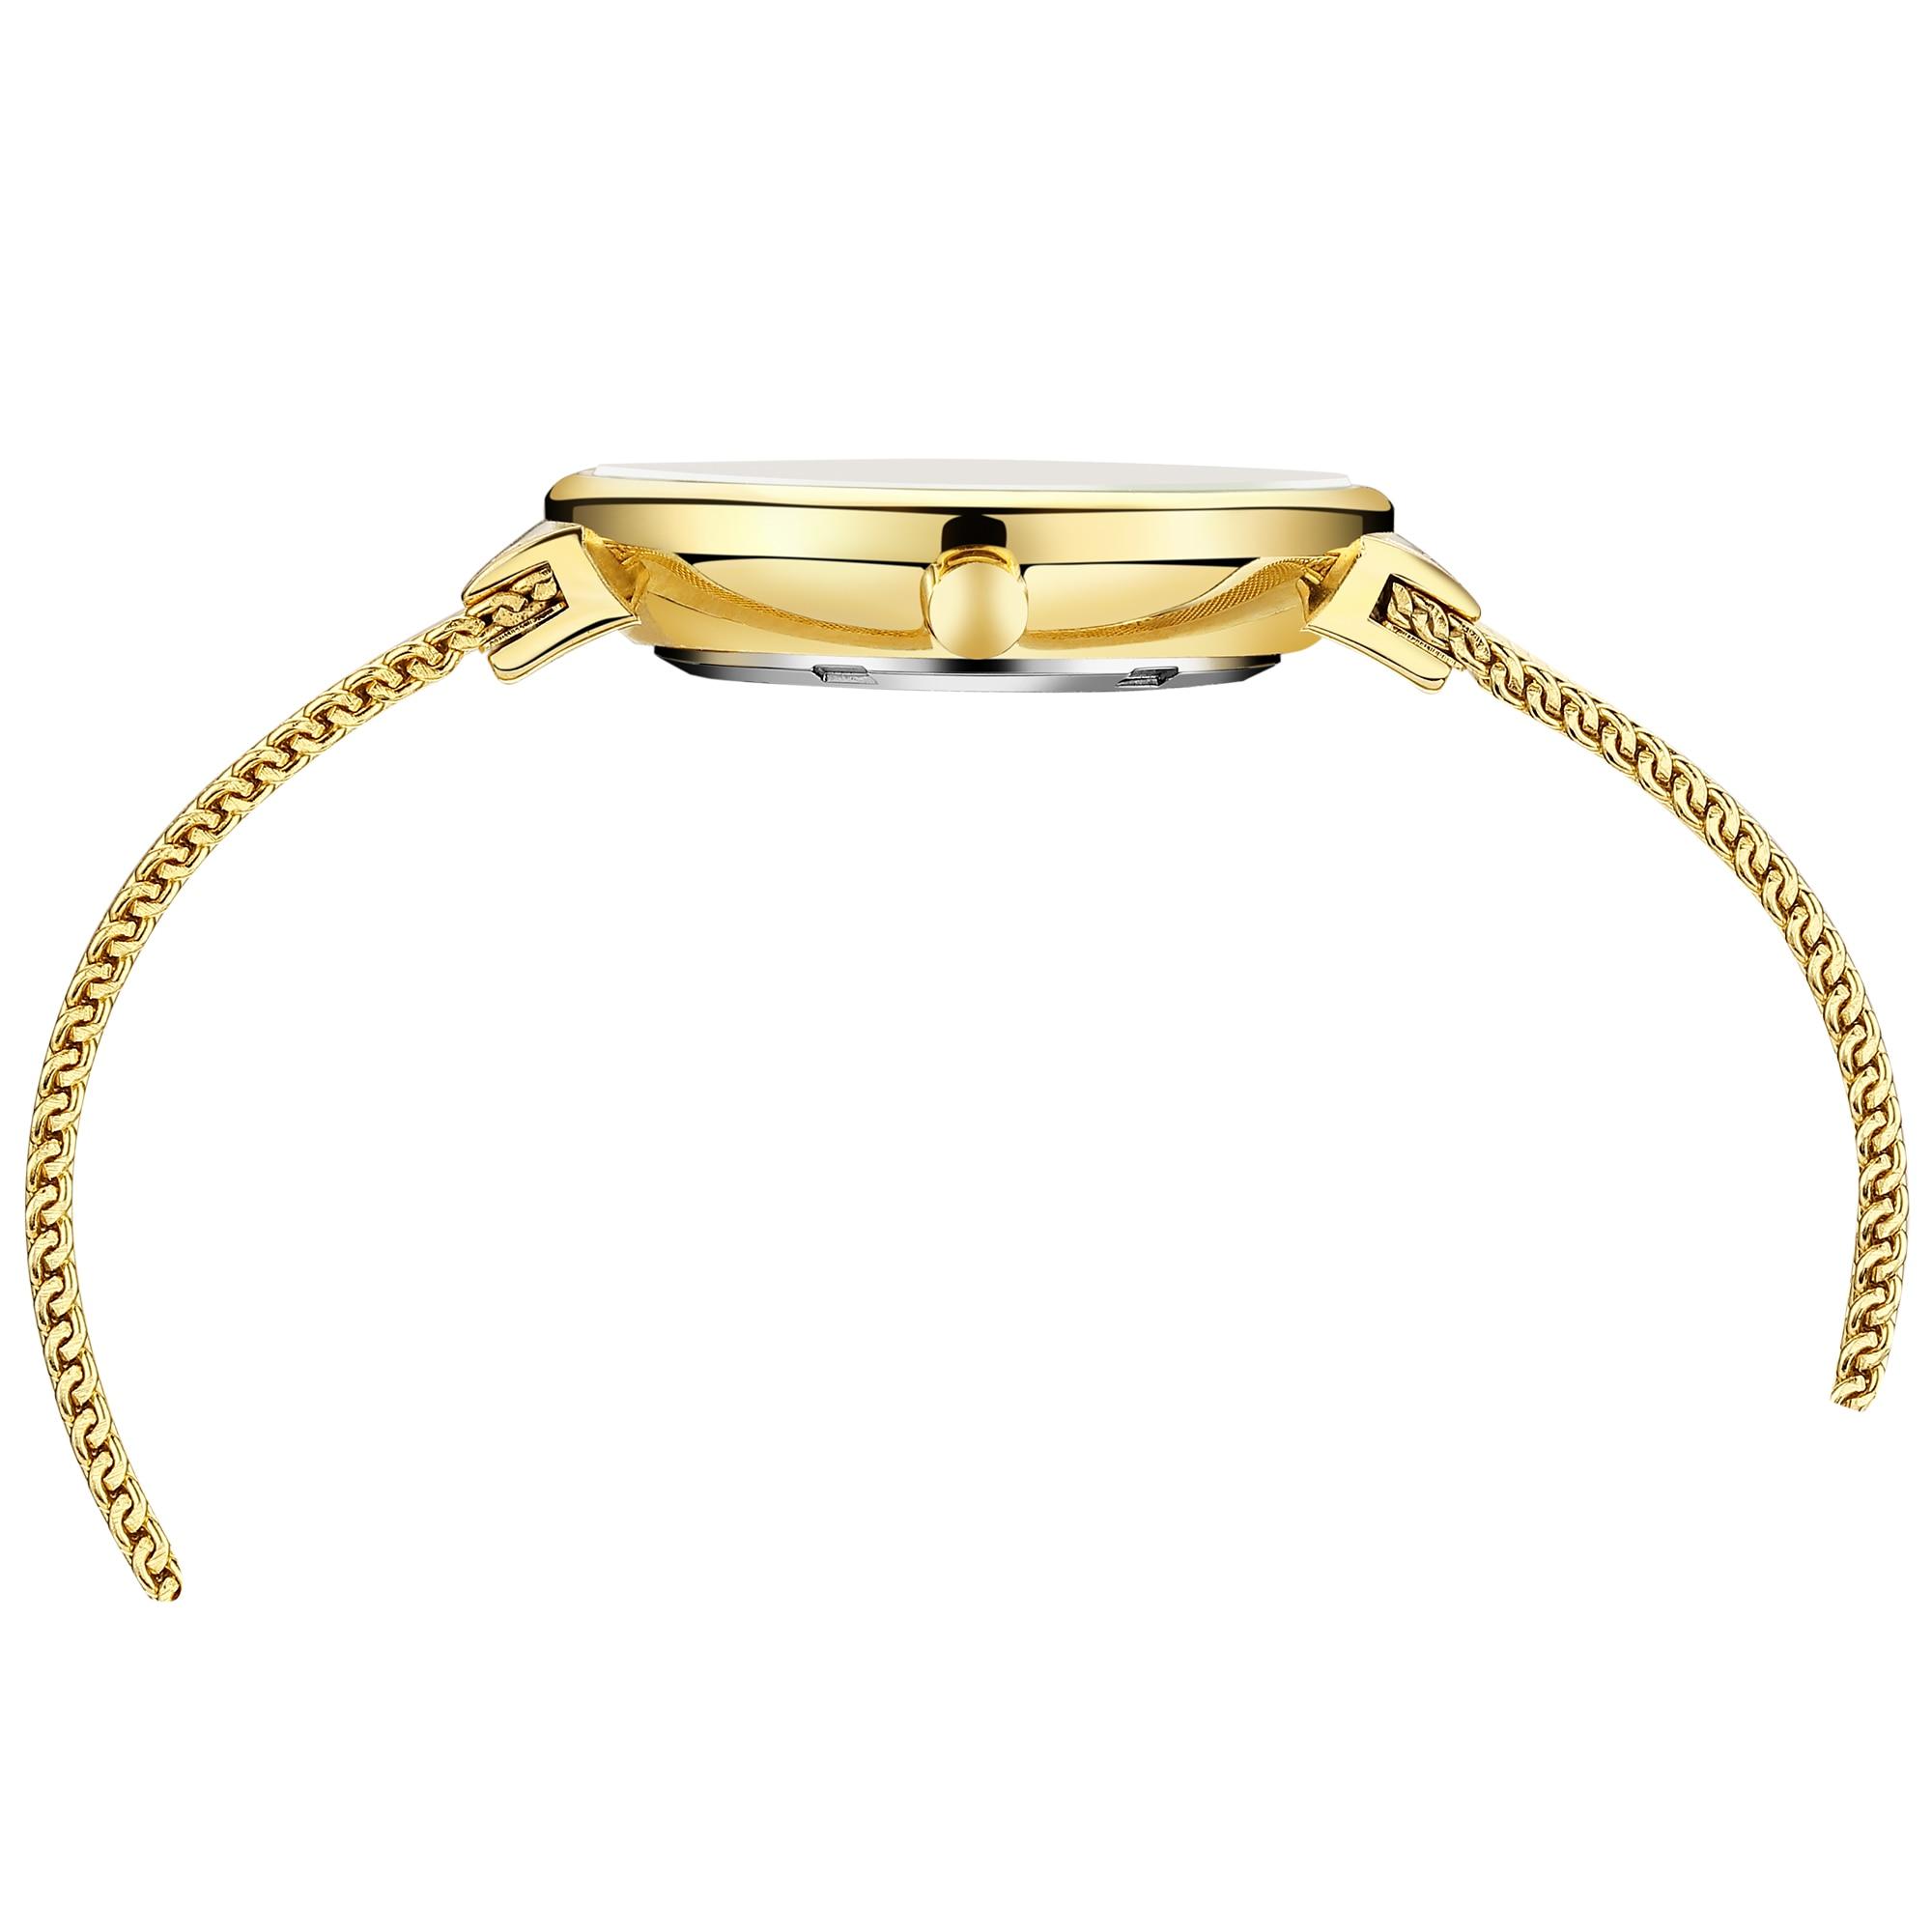 CURREN Female Watch Simple Casual Design Women Wristwatches High Quality Waterproof Mesh Quartz Watches Top Brand Zegarek Damski enlarge